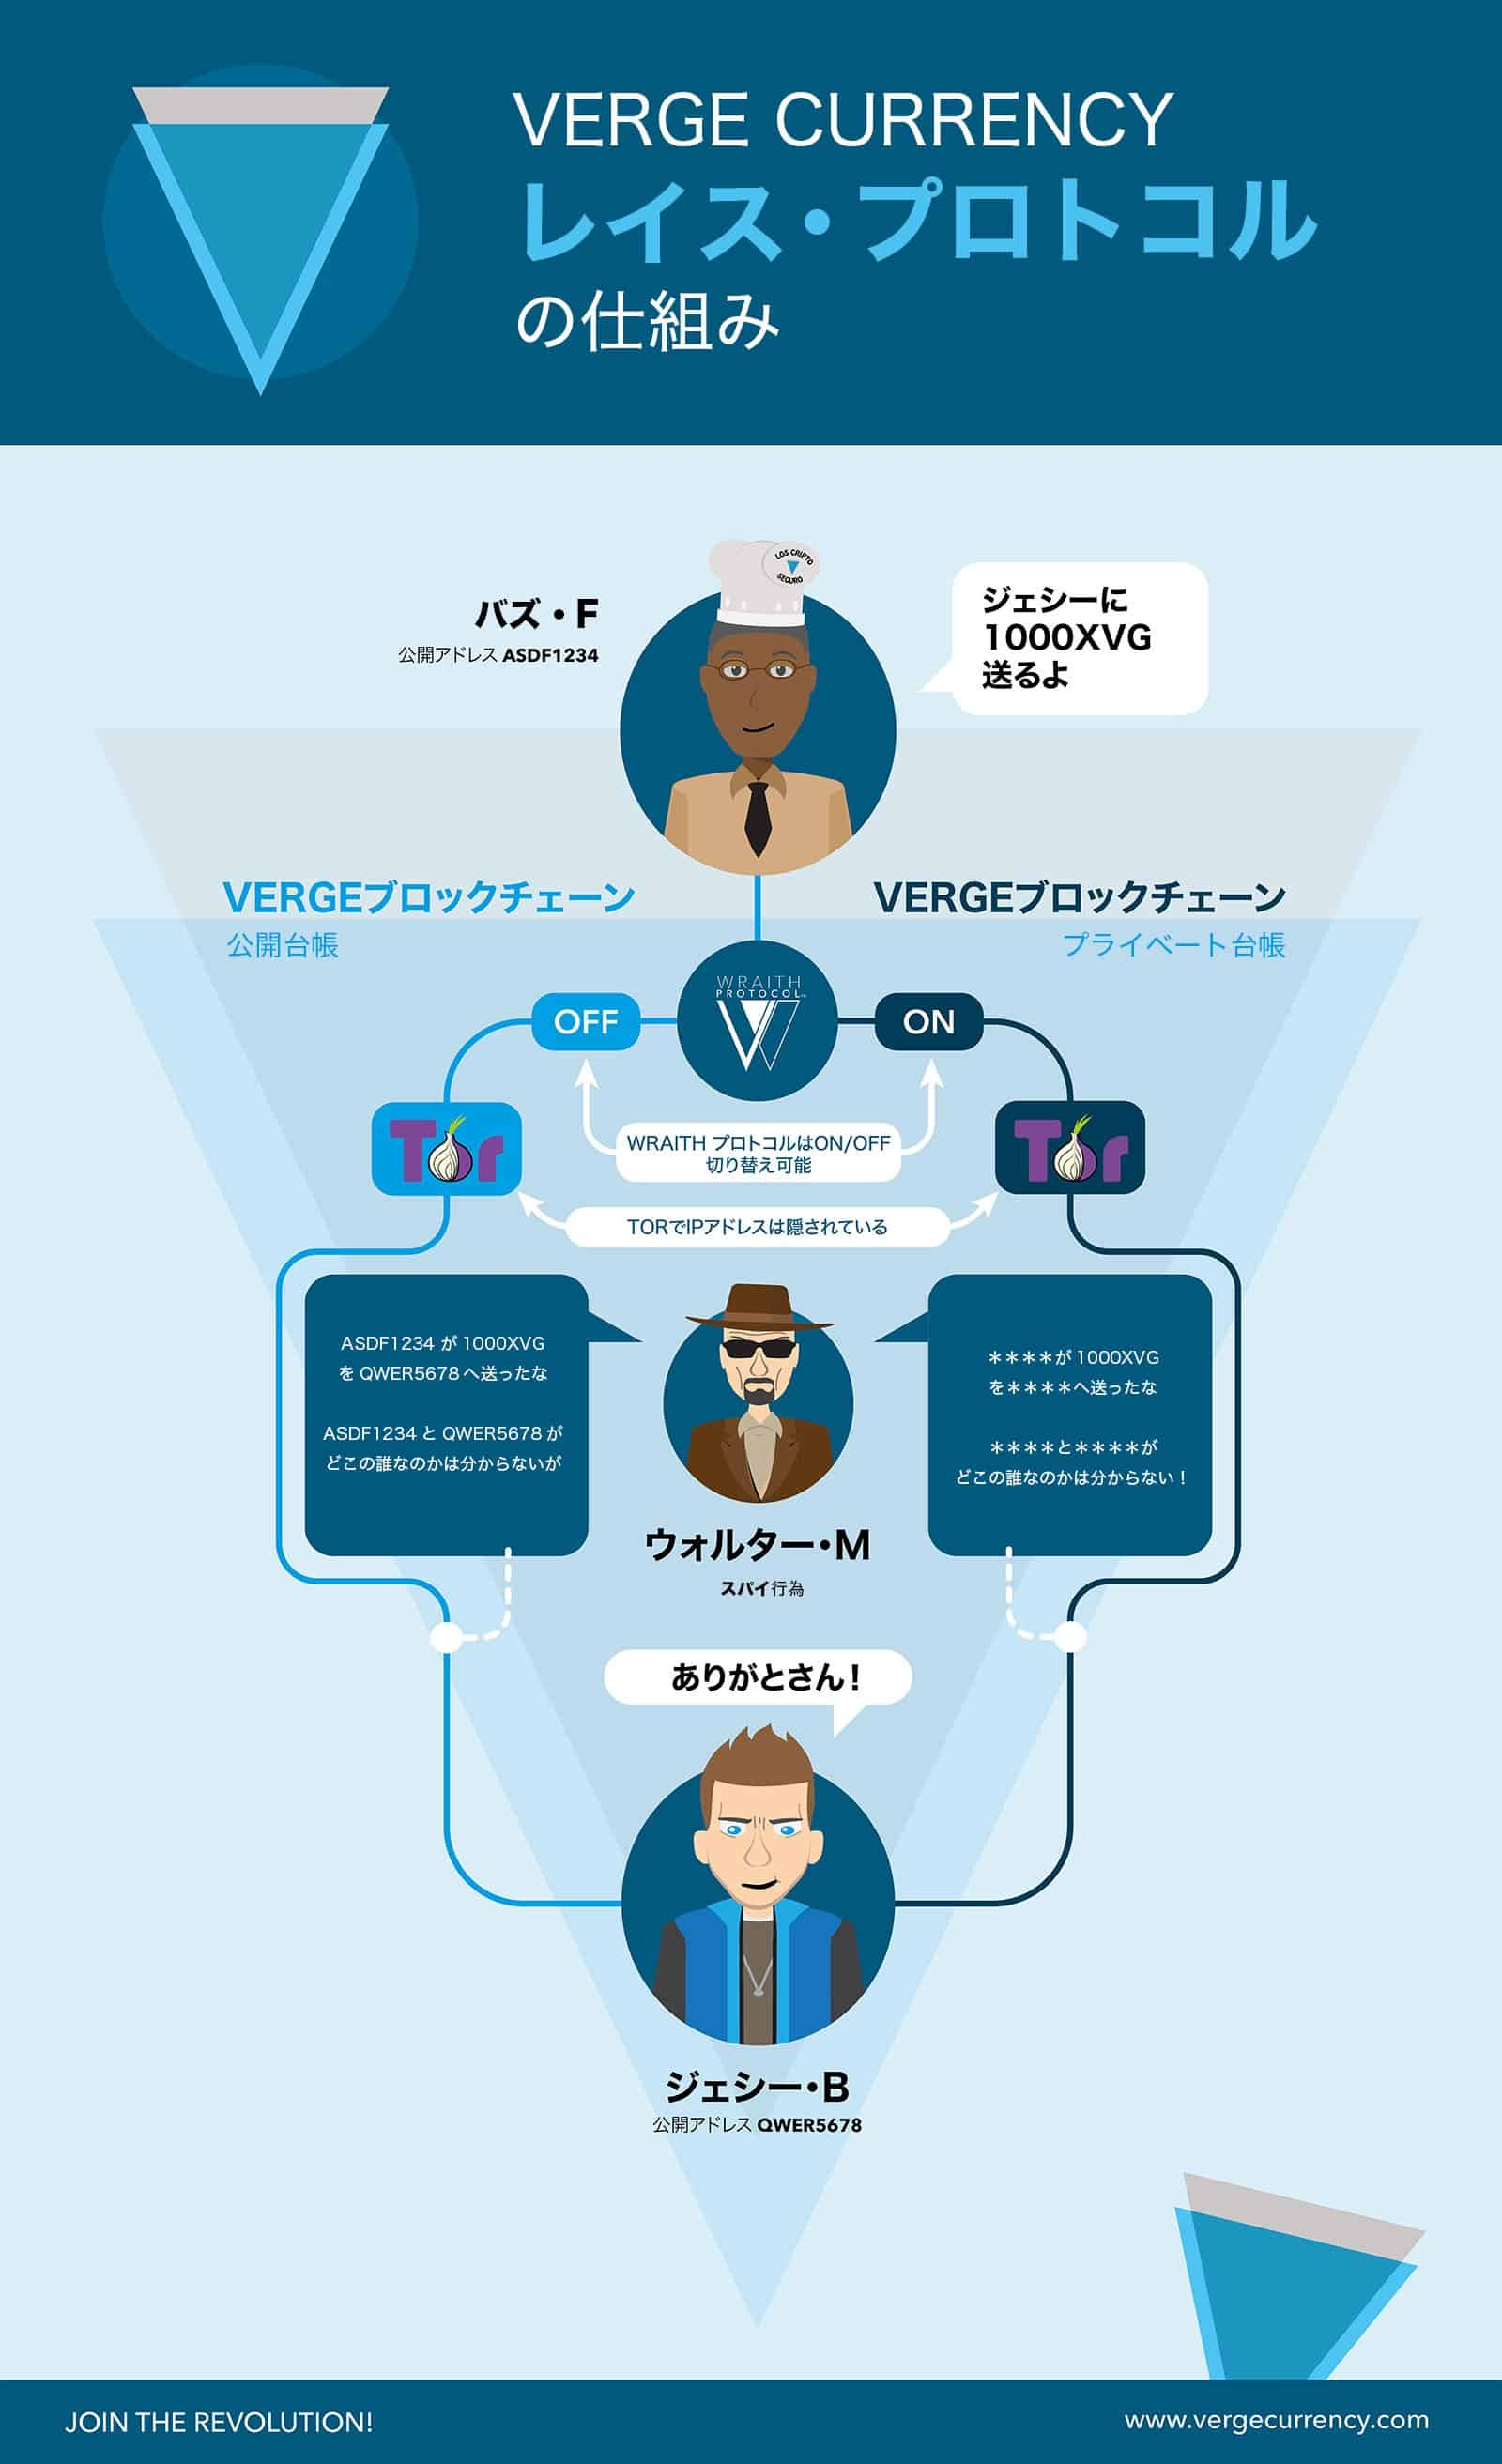 Verge(ヴァージ)とは|仮想通貨の特徴・価格・チャート・取引所2